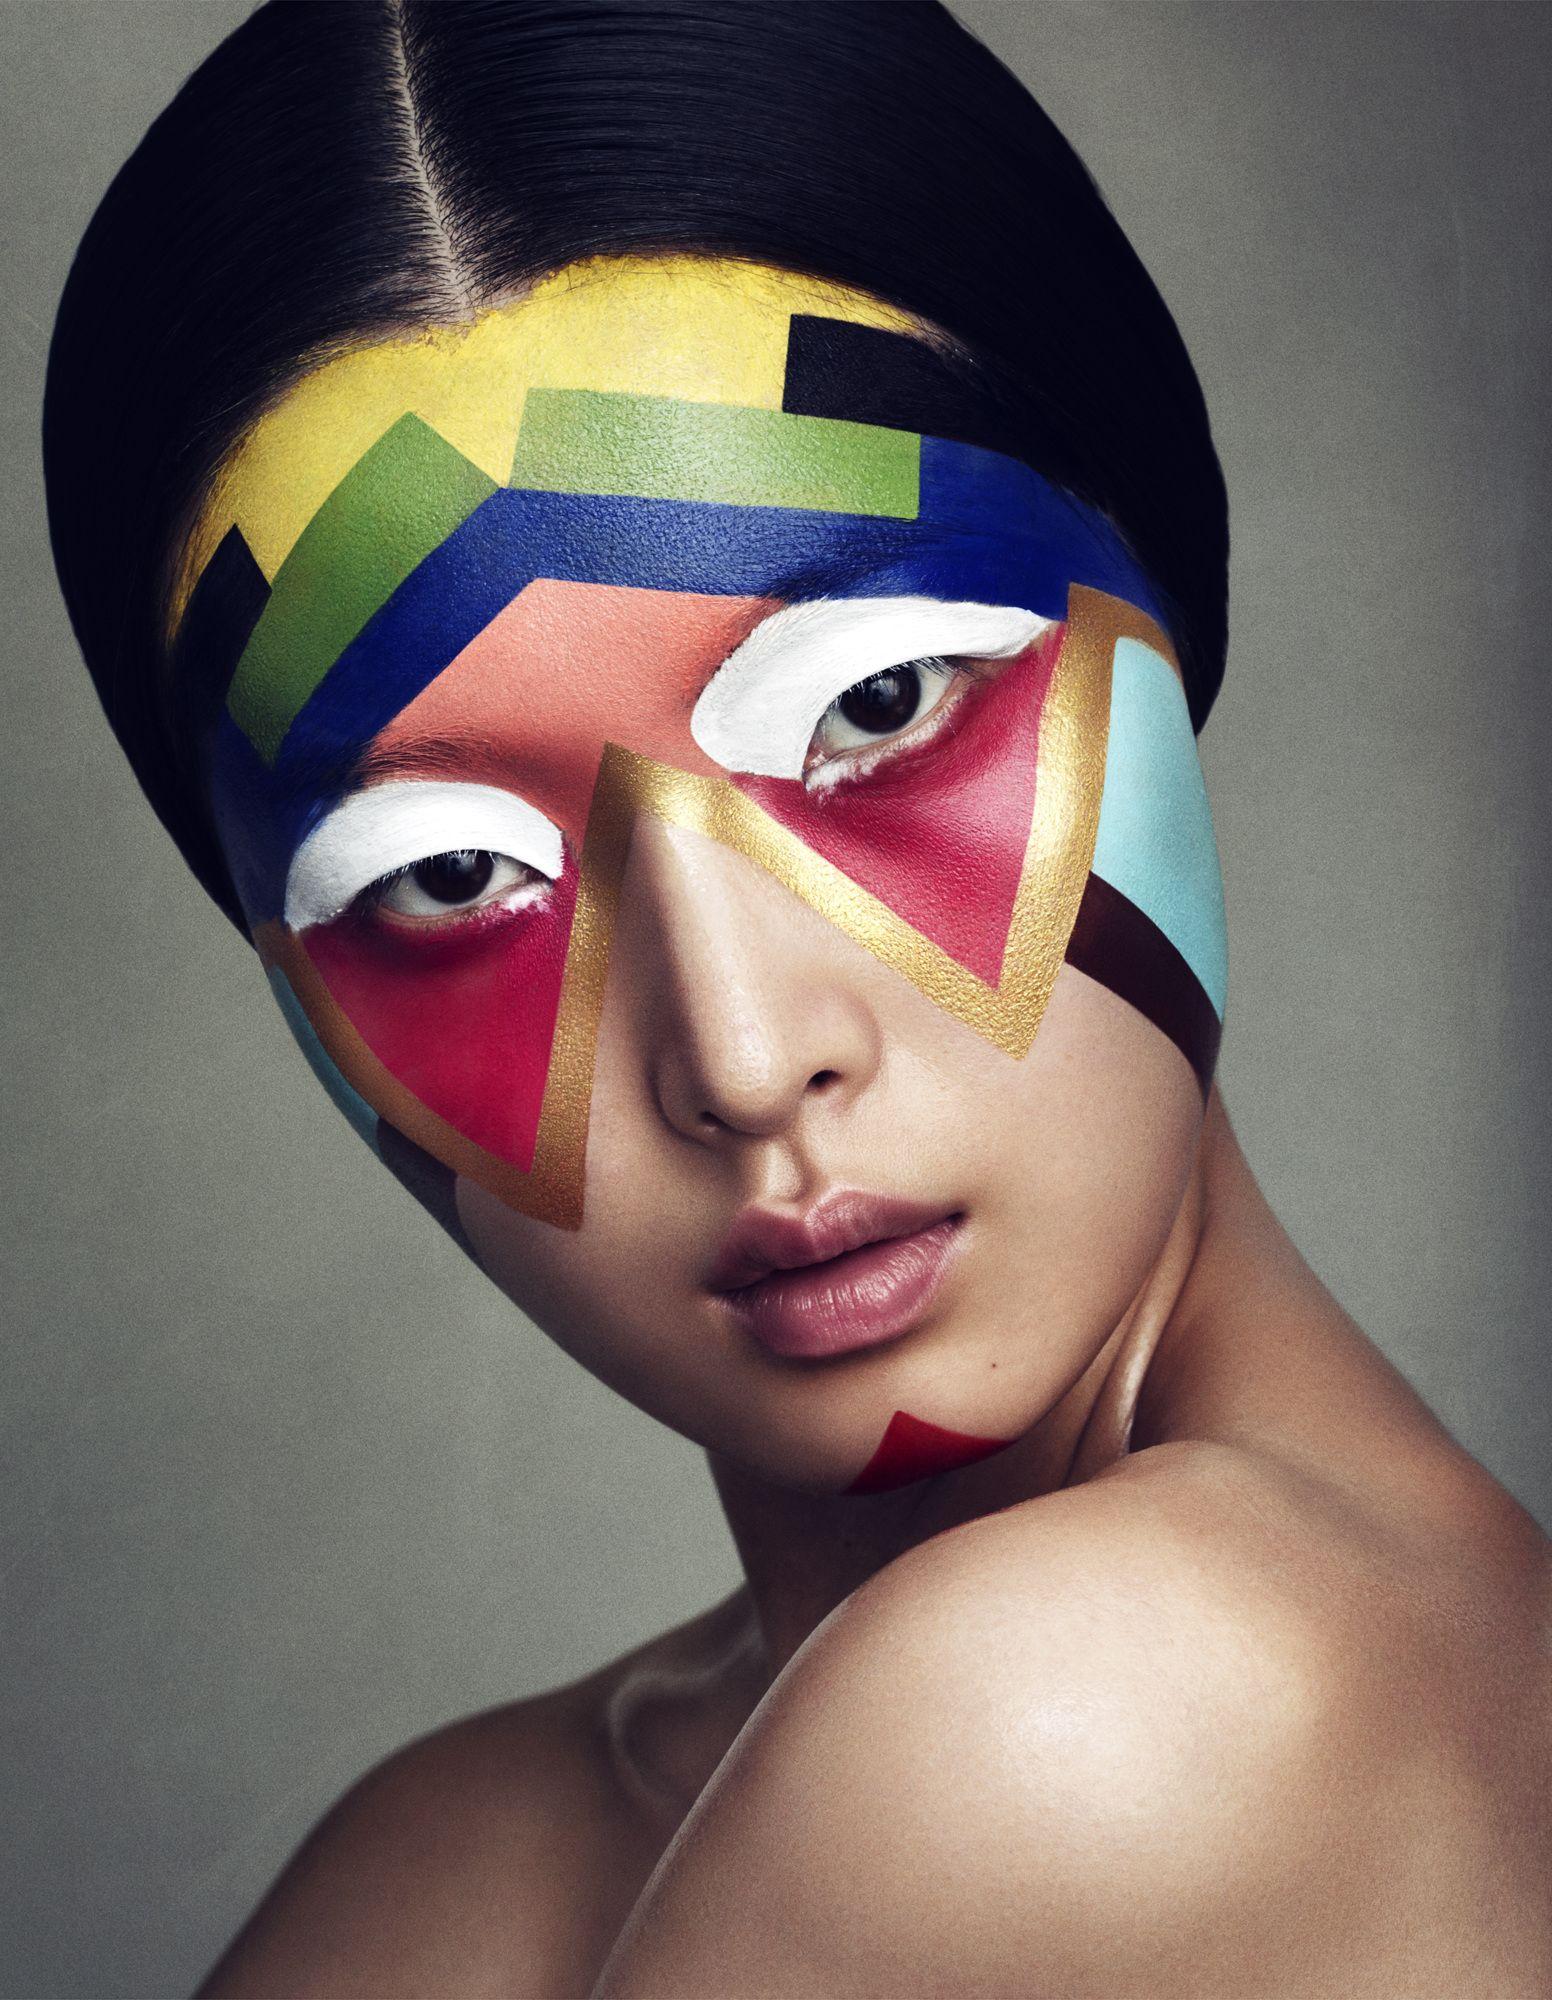 BON Magazine / Beauty Photographer Benjamin Vnuk